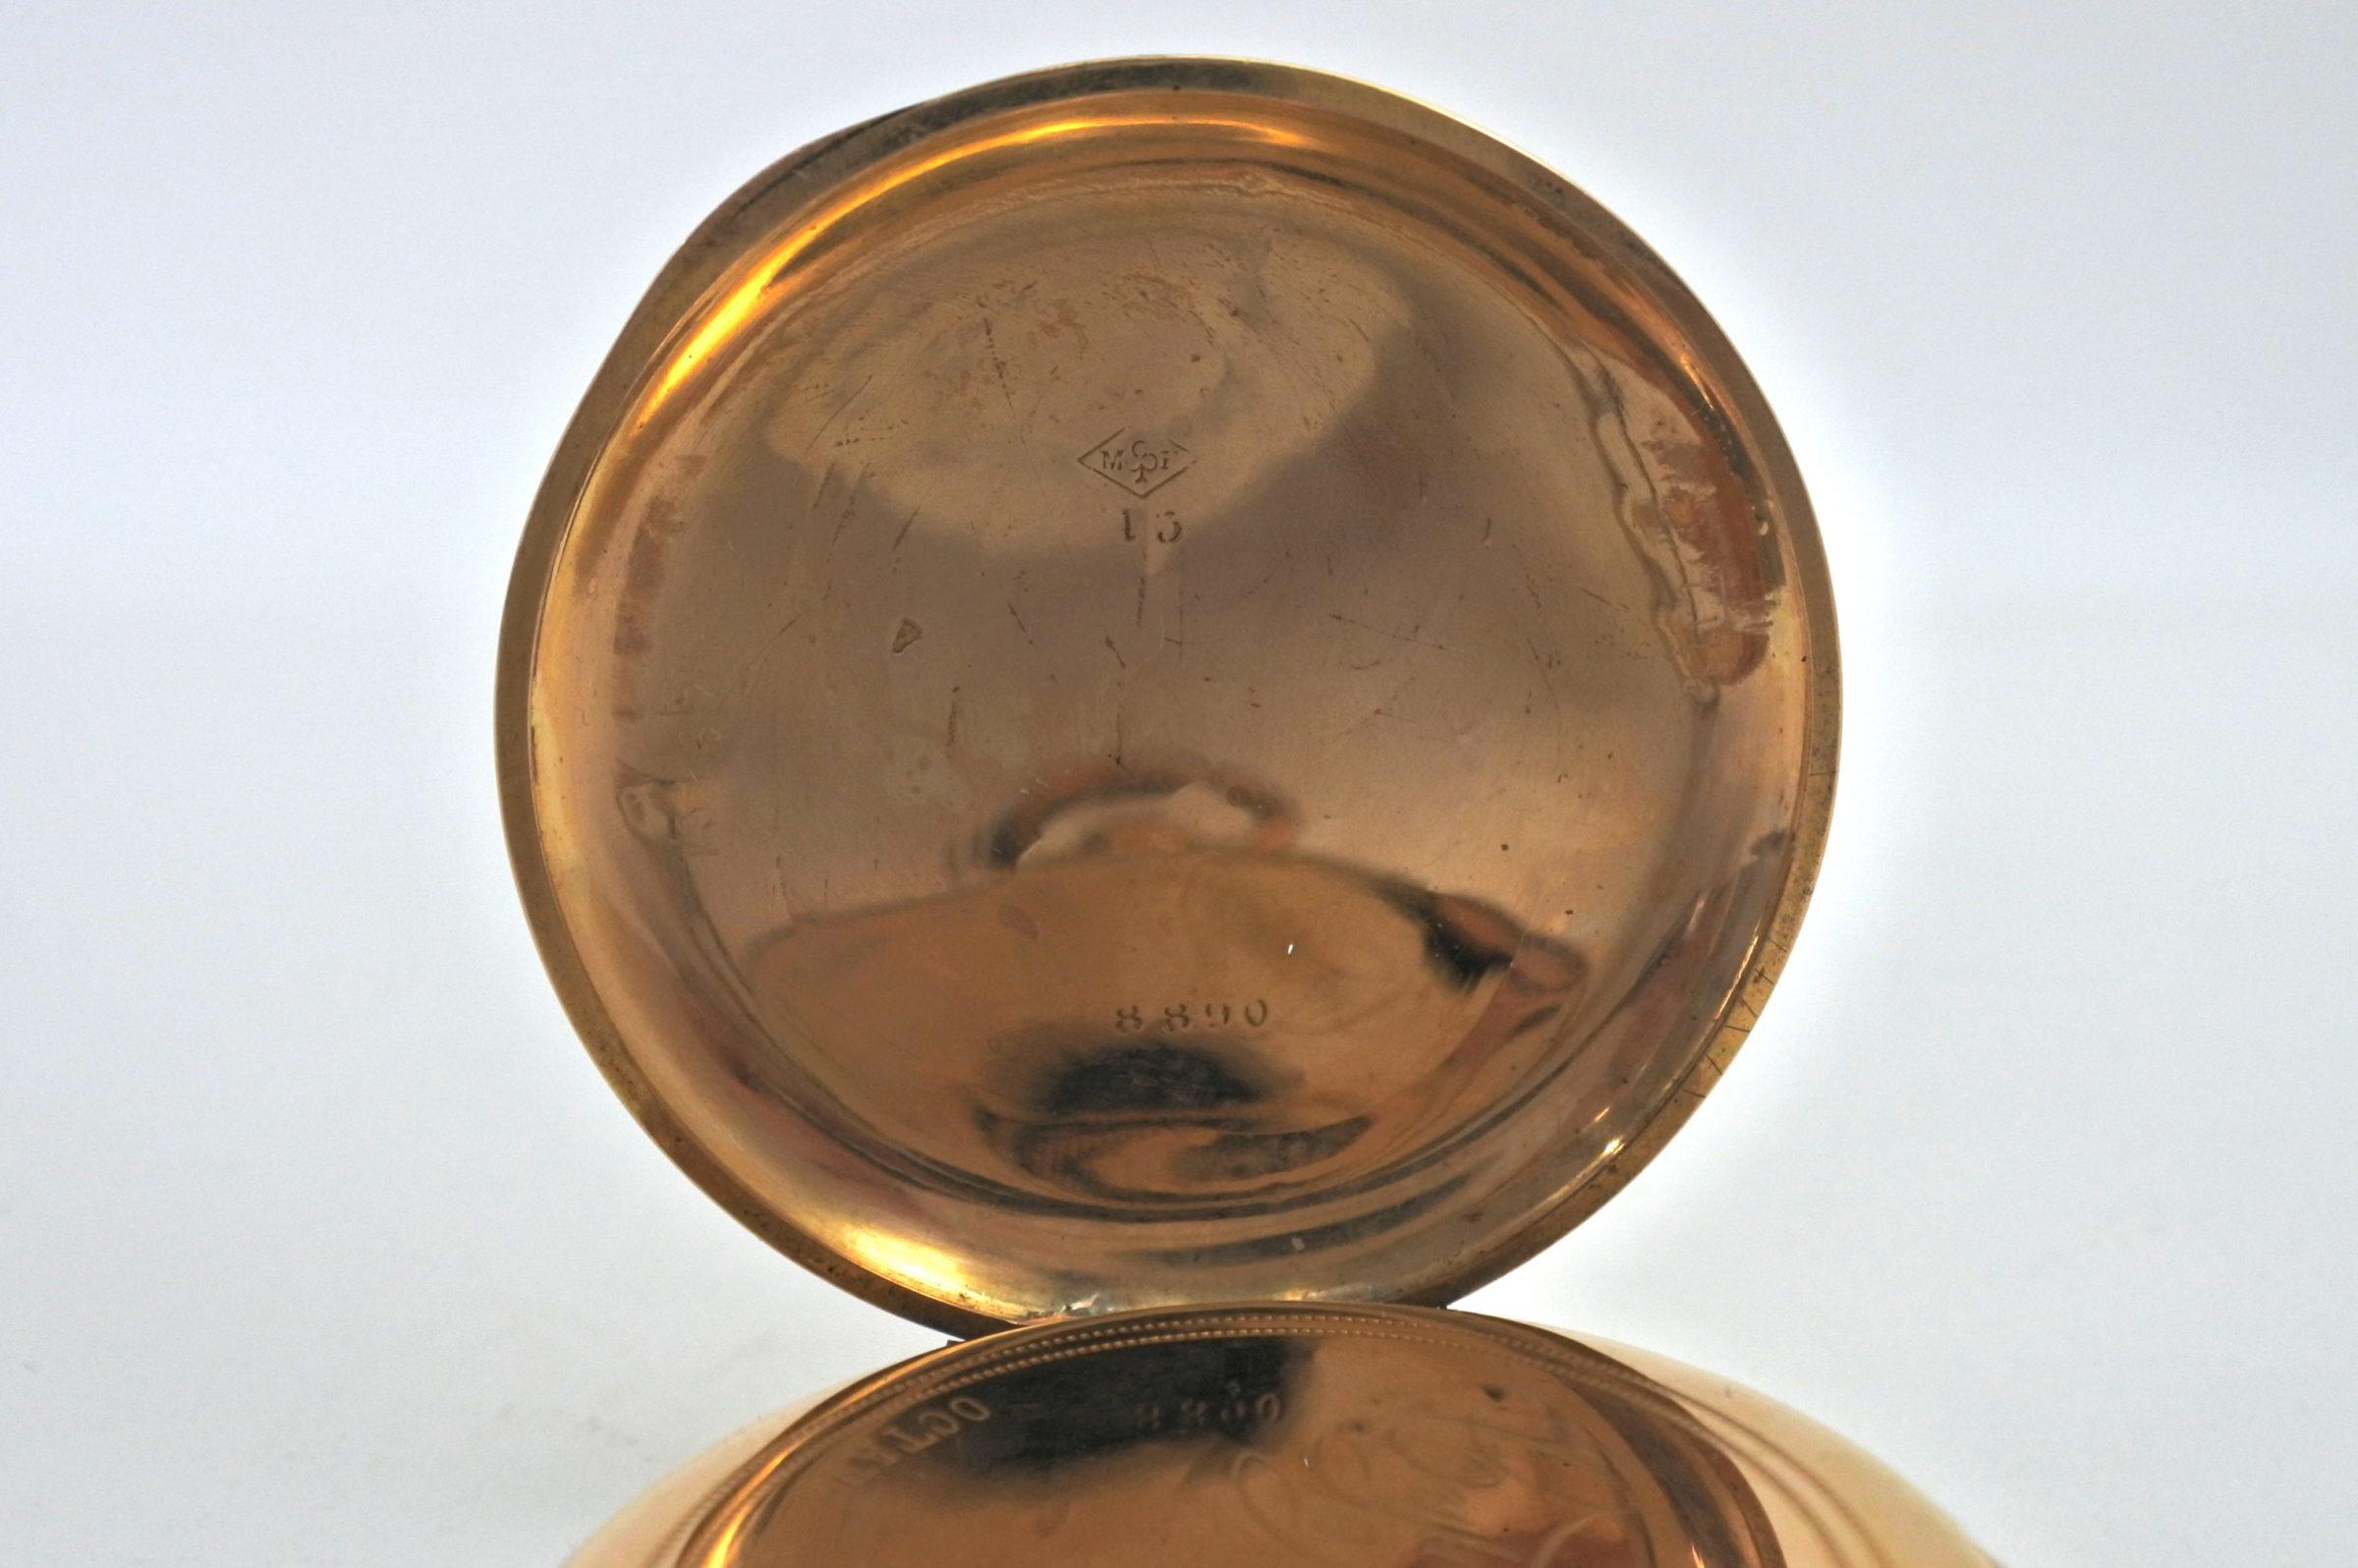 Orologio da tasca in oro - Octave Dupont - 3